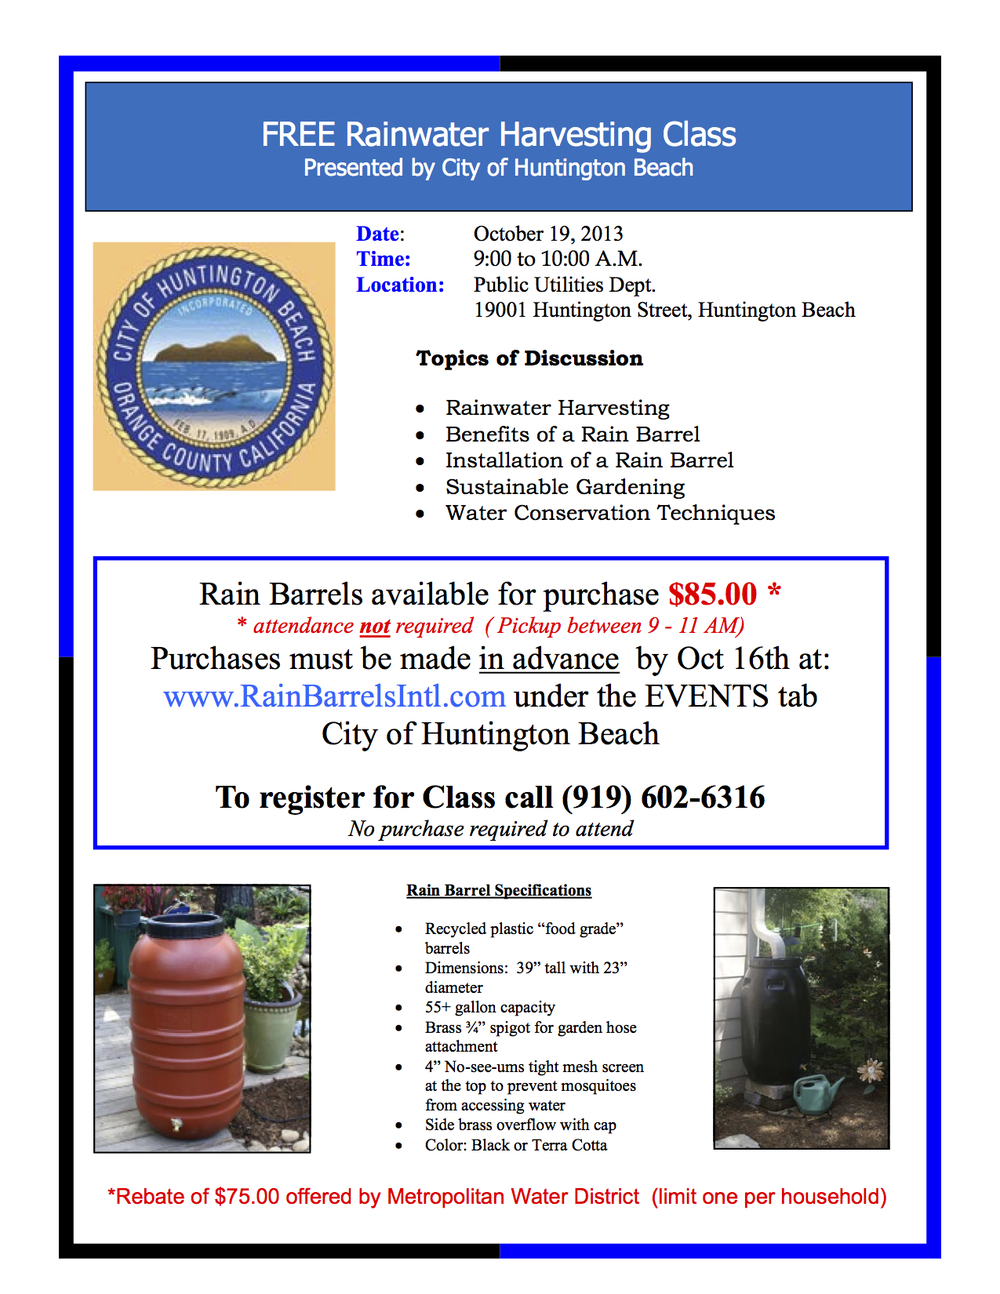 Rainwater-Harvesting-Class.jpg